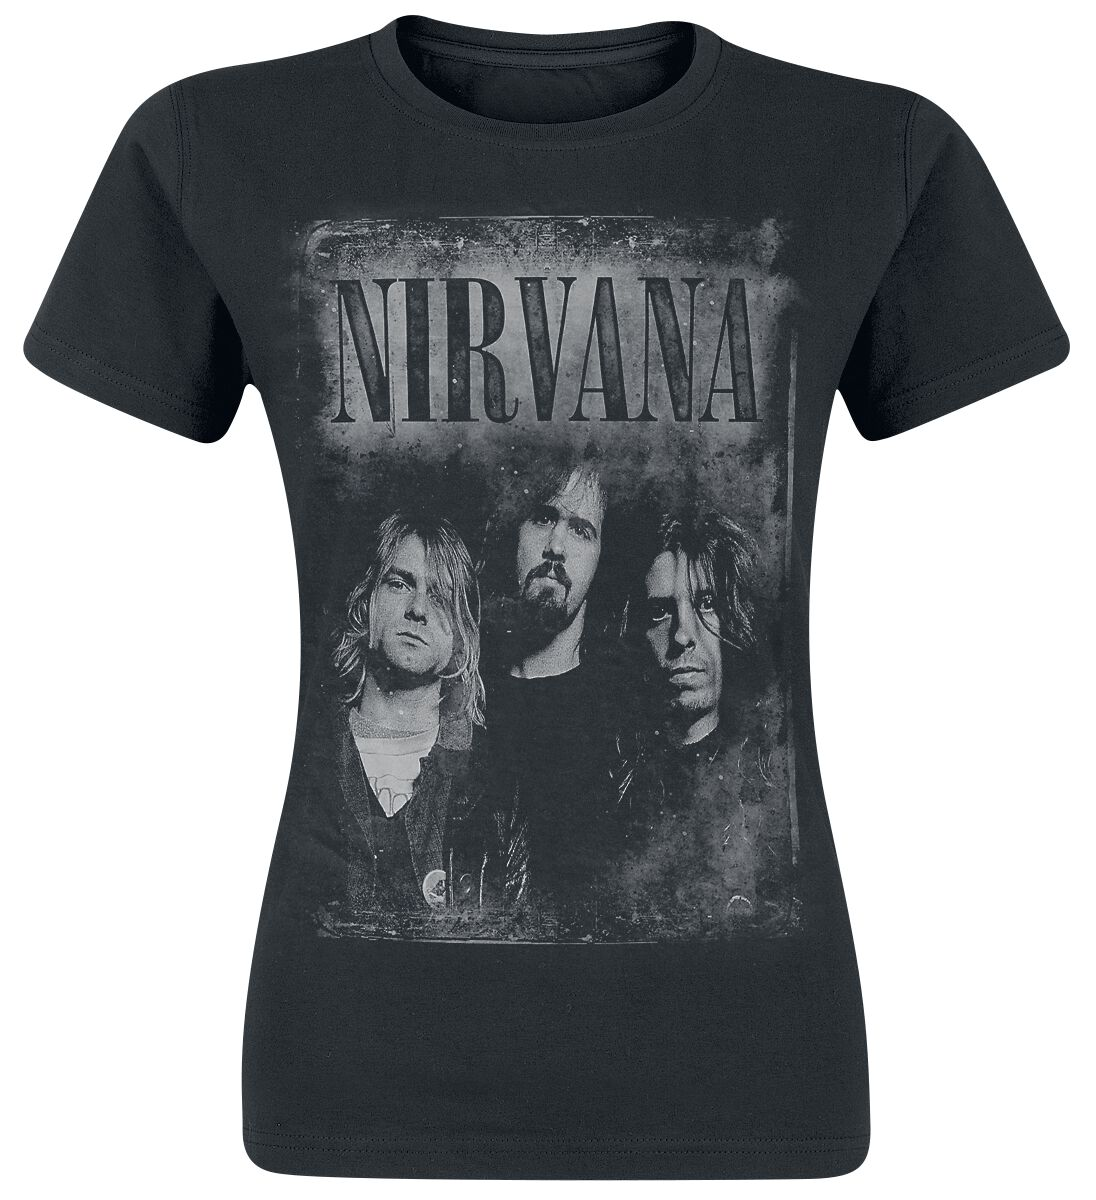 Zespoły - Koszulki - Koszulka damska Nirvana Faded Faces Koszulka damska czarny - 317135